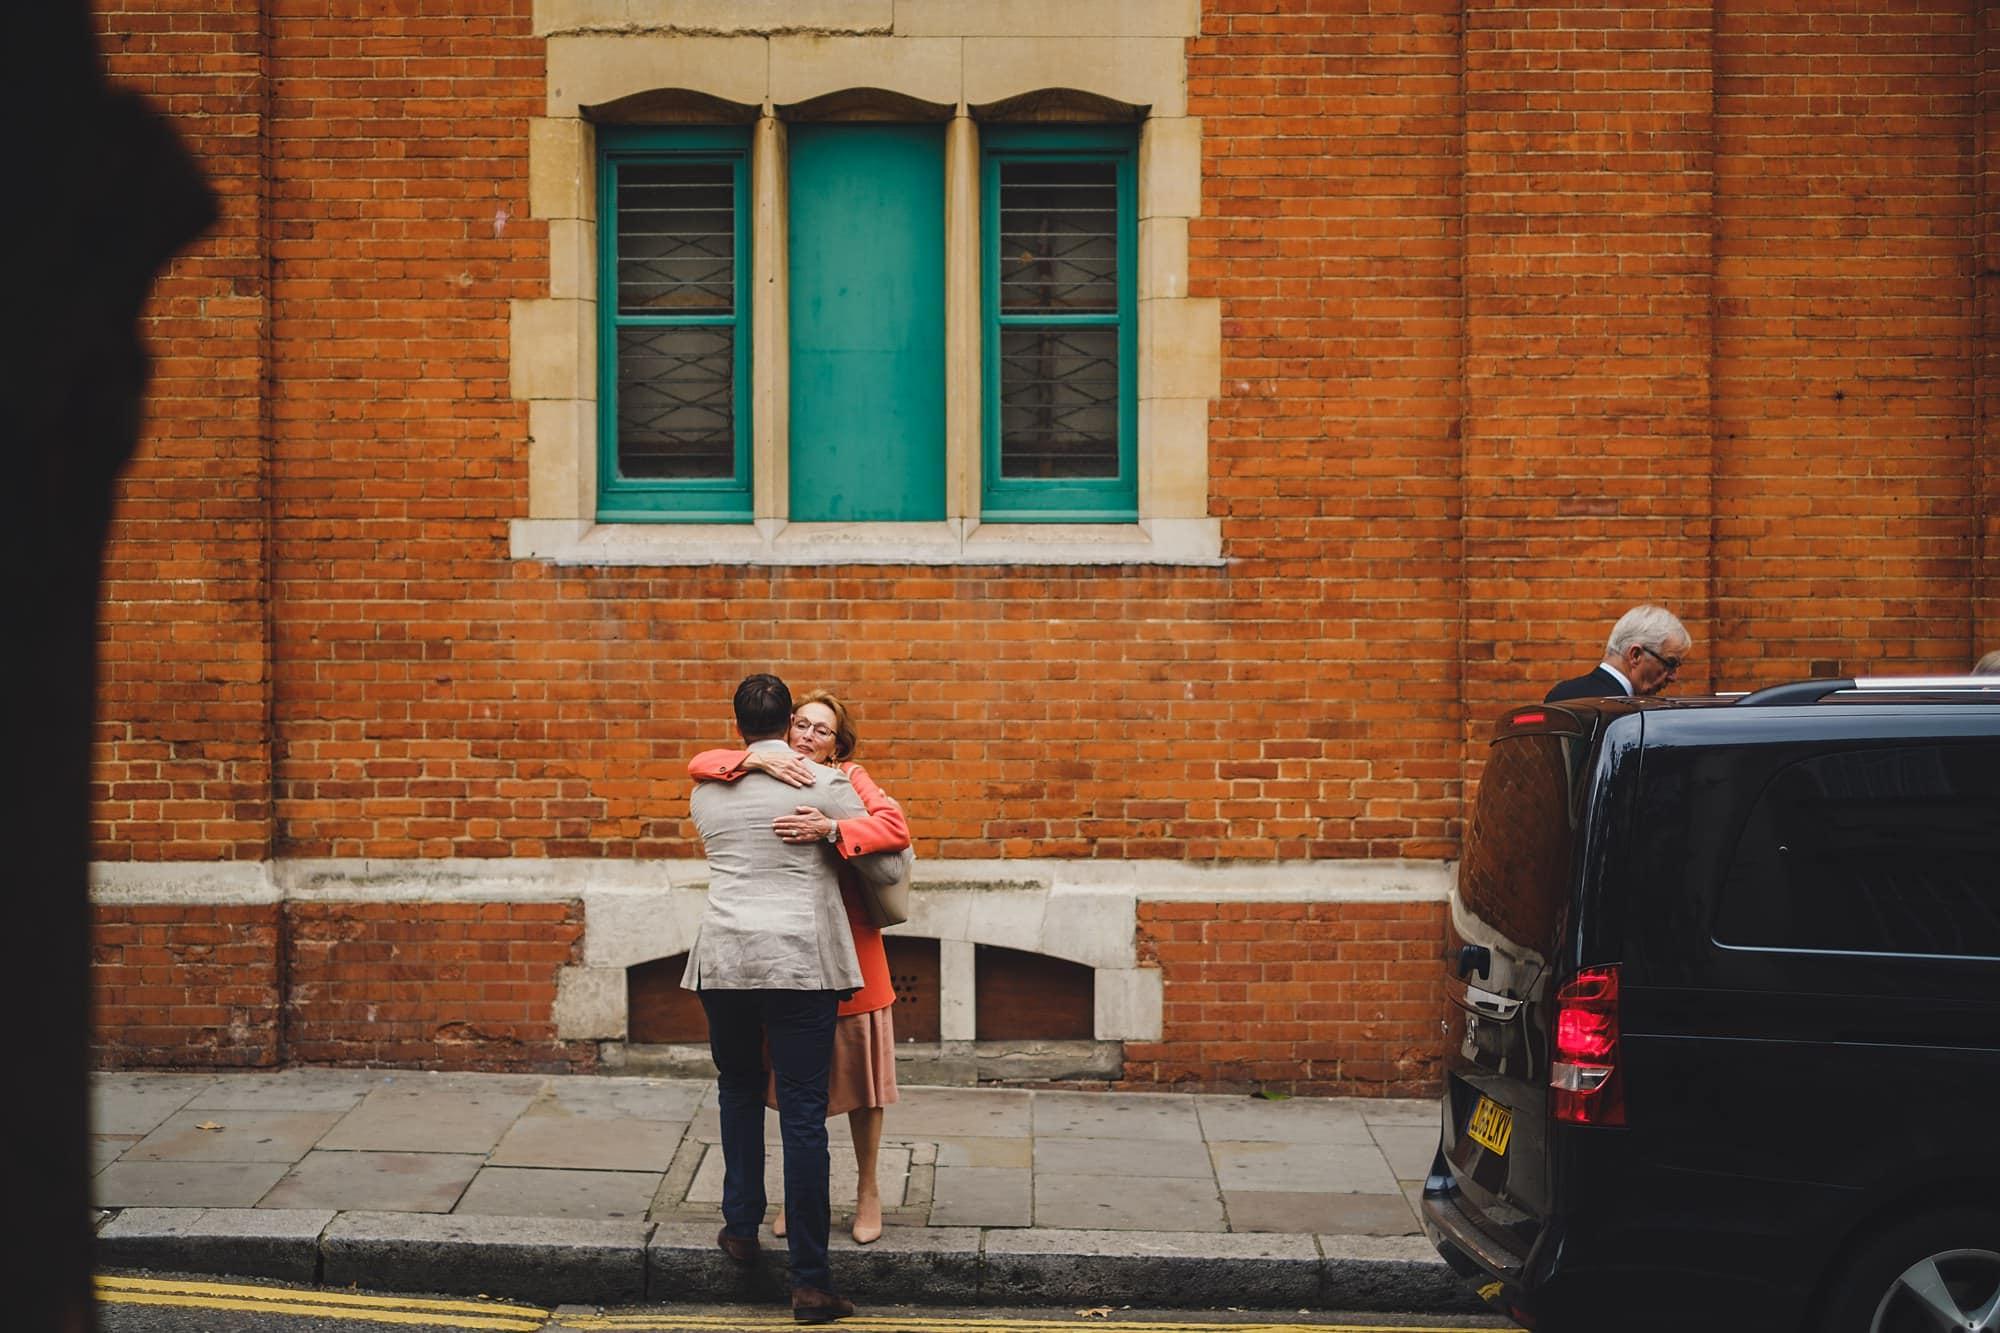 chelsea old town hall wedding photographer te 022 - Tara + Ed